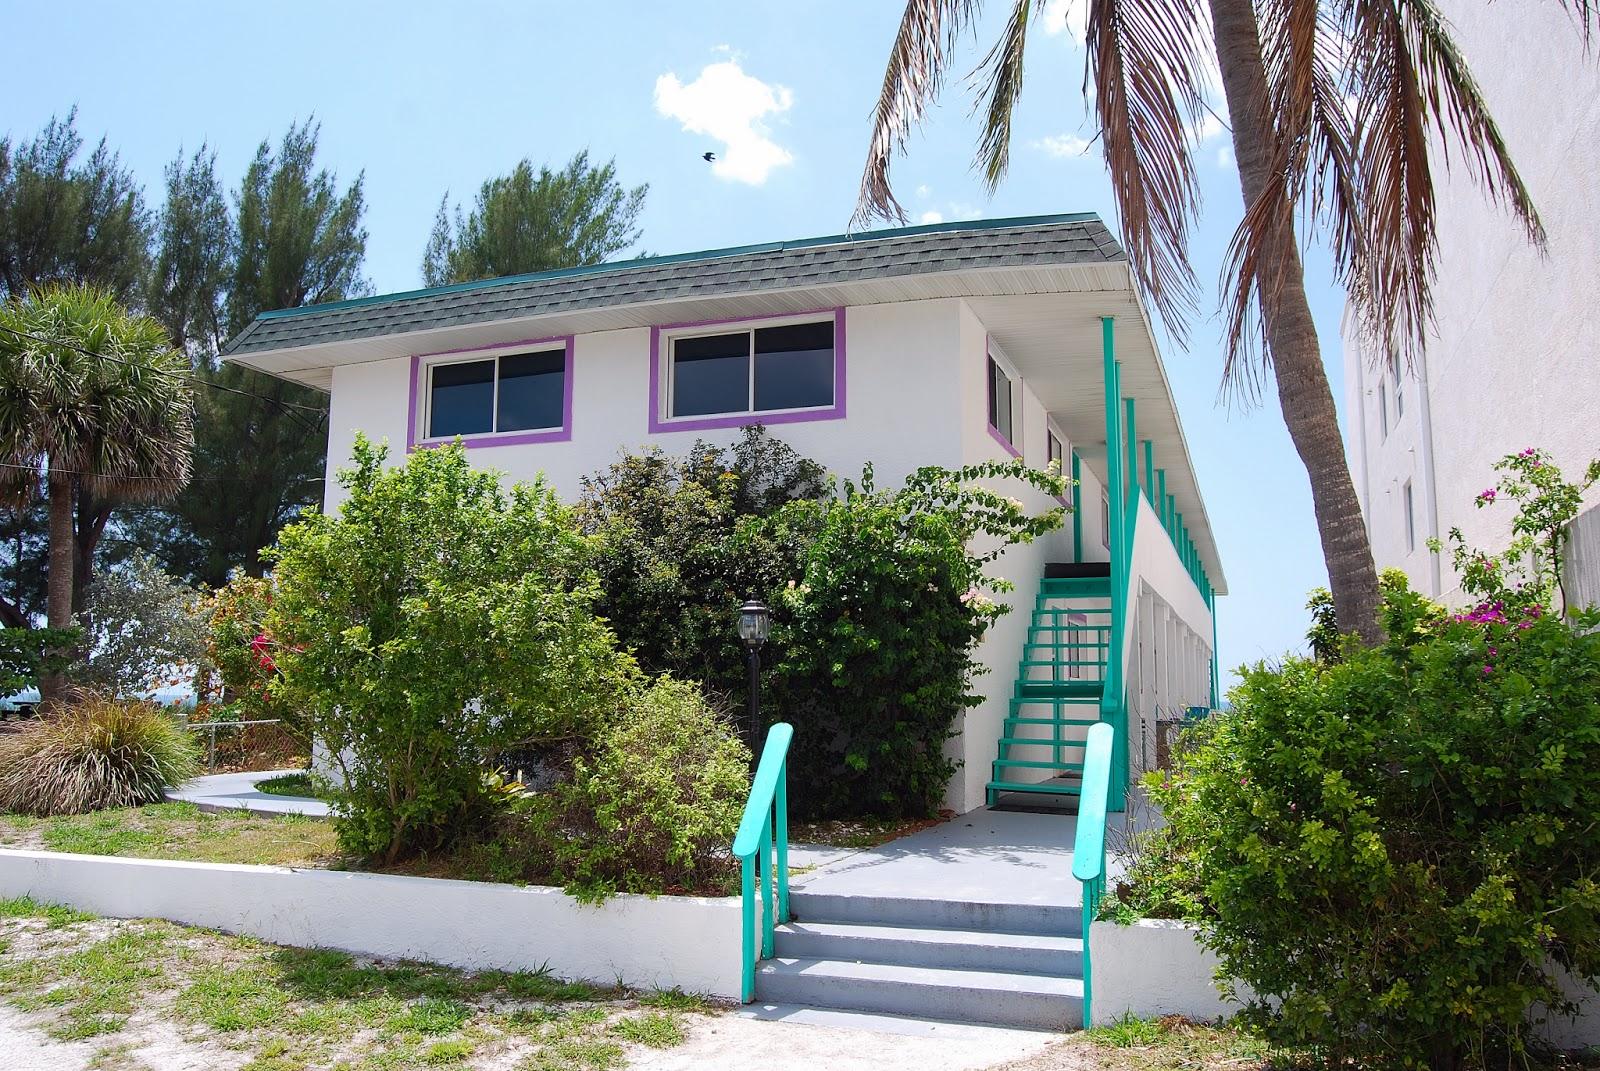 Beach Hotel for sale in Manasota Key: The Island House is ...